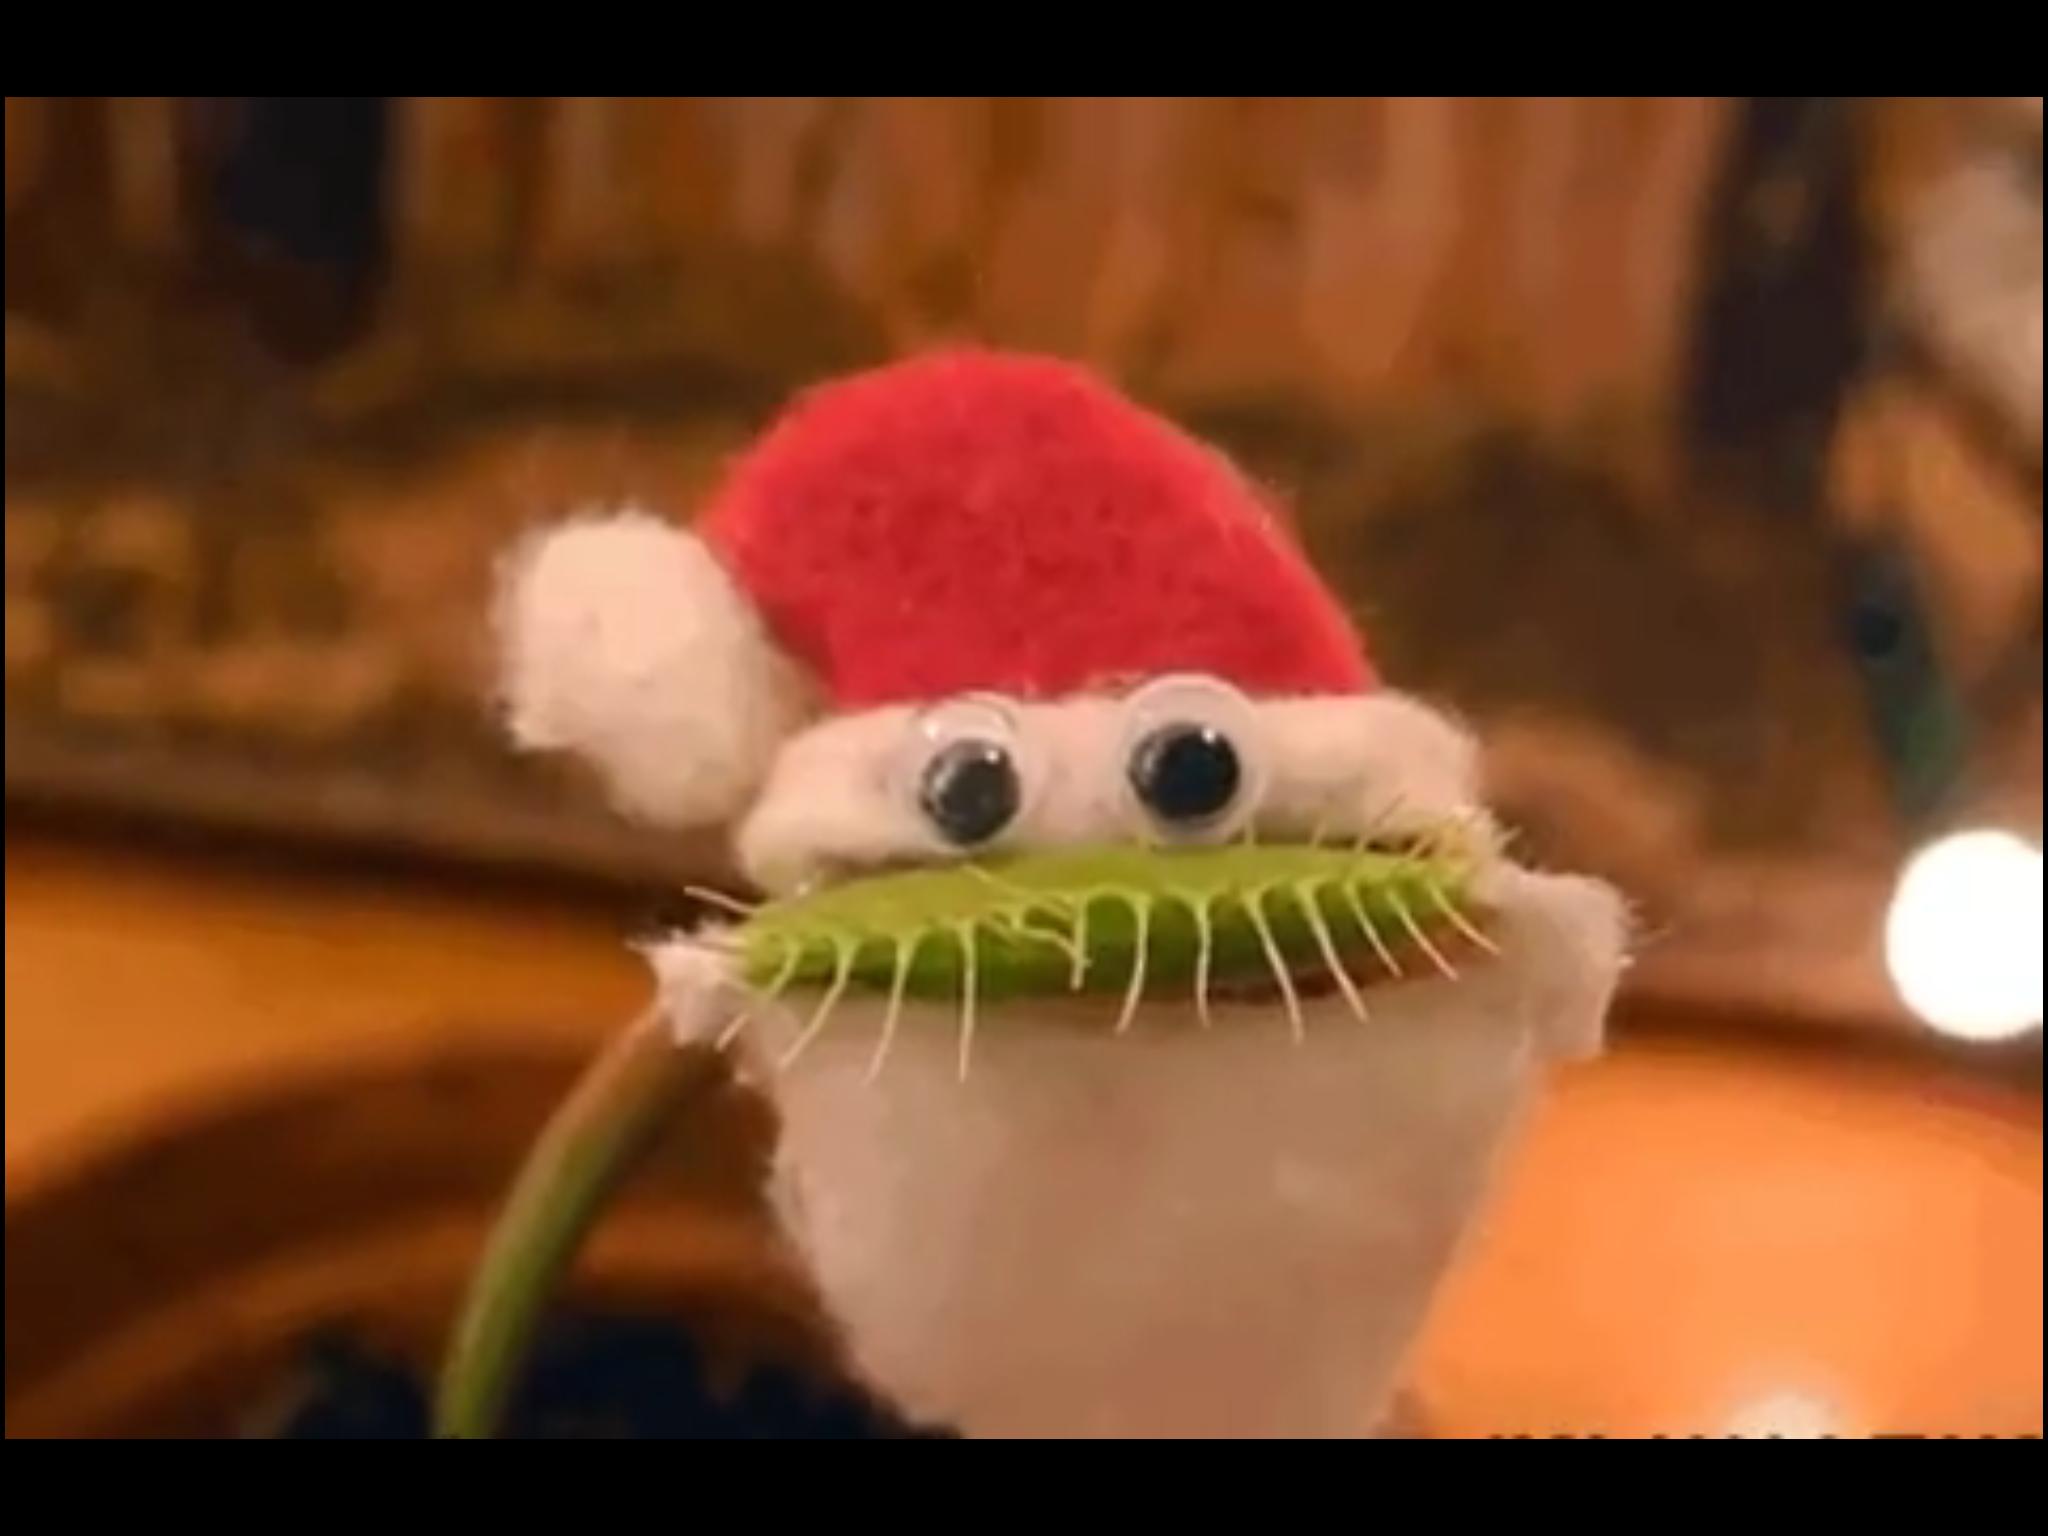 Santa Claus Made Out Of A Venus Flytrap Venus Fly Trap Venus Fly Traps